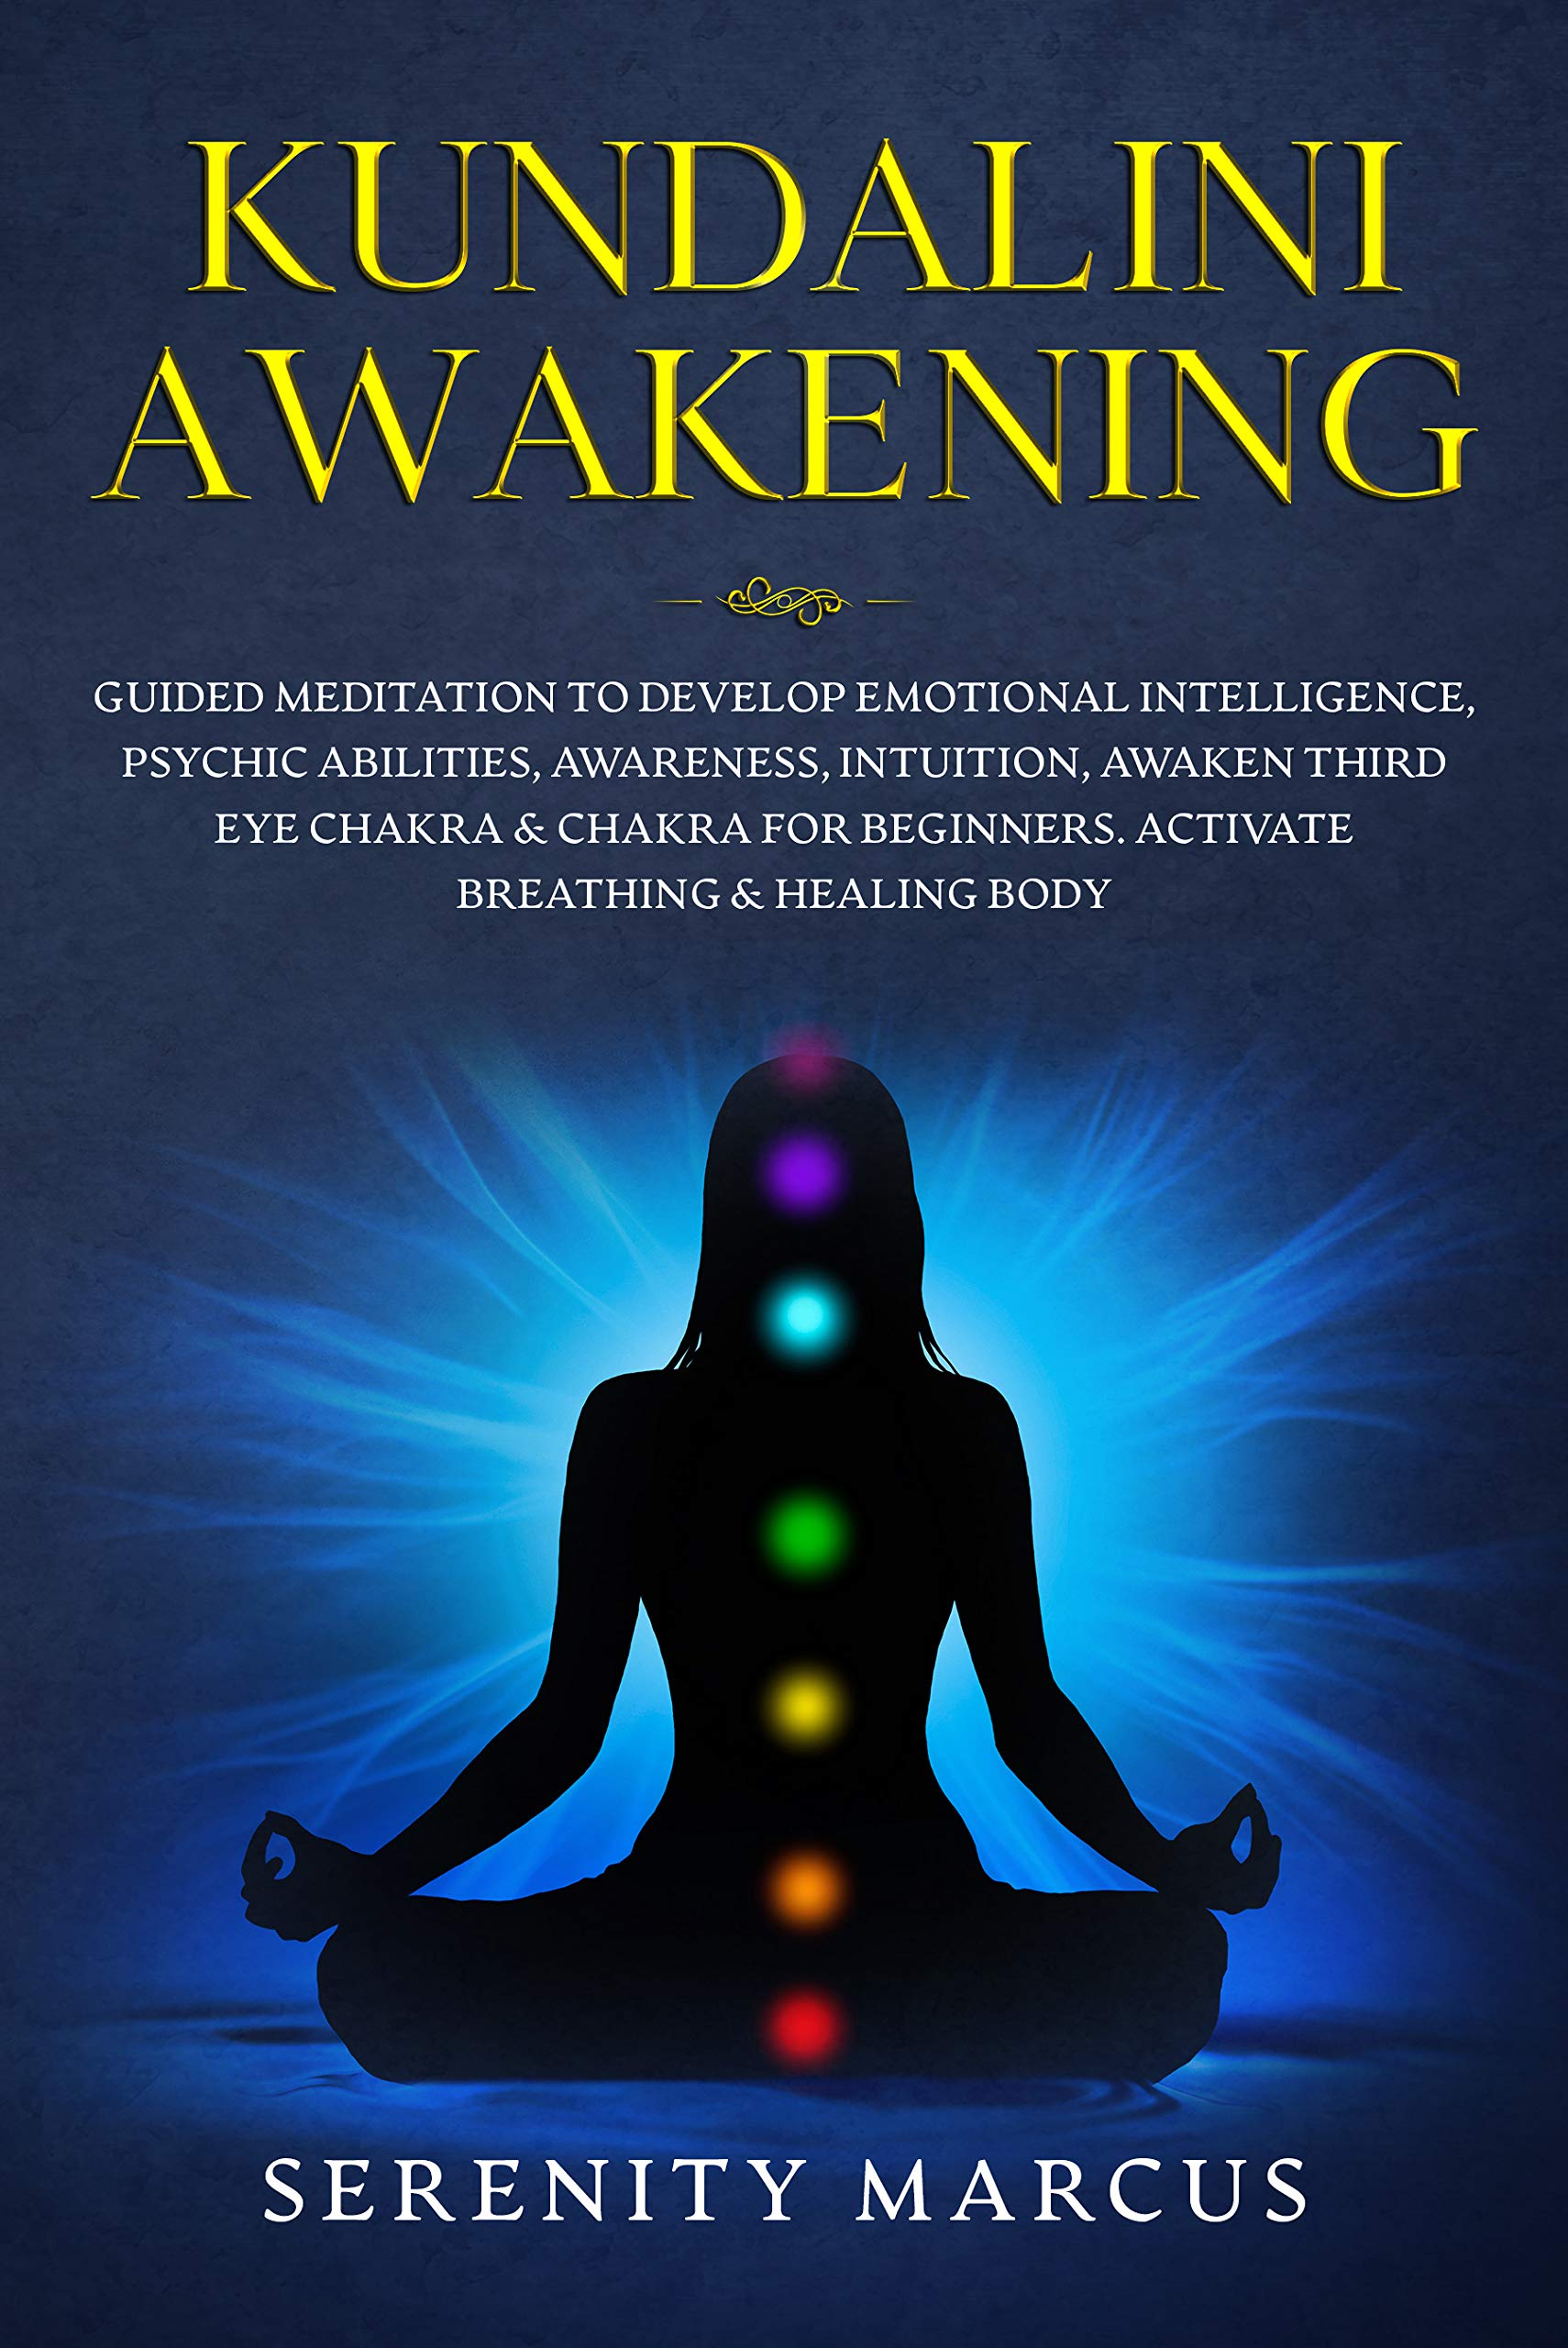 Kundalini Awakening: Guided Meditation To Develop Emotional Intelligence, Psychic Abilities, Awareness, Intuition, Awaken Third Eye Chakra & Chakra For Beginners. Activate Breathing & Healing Body.